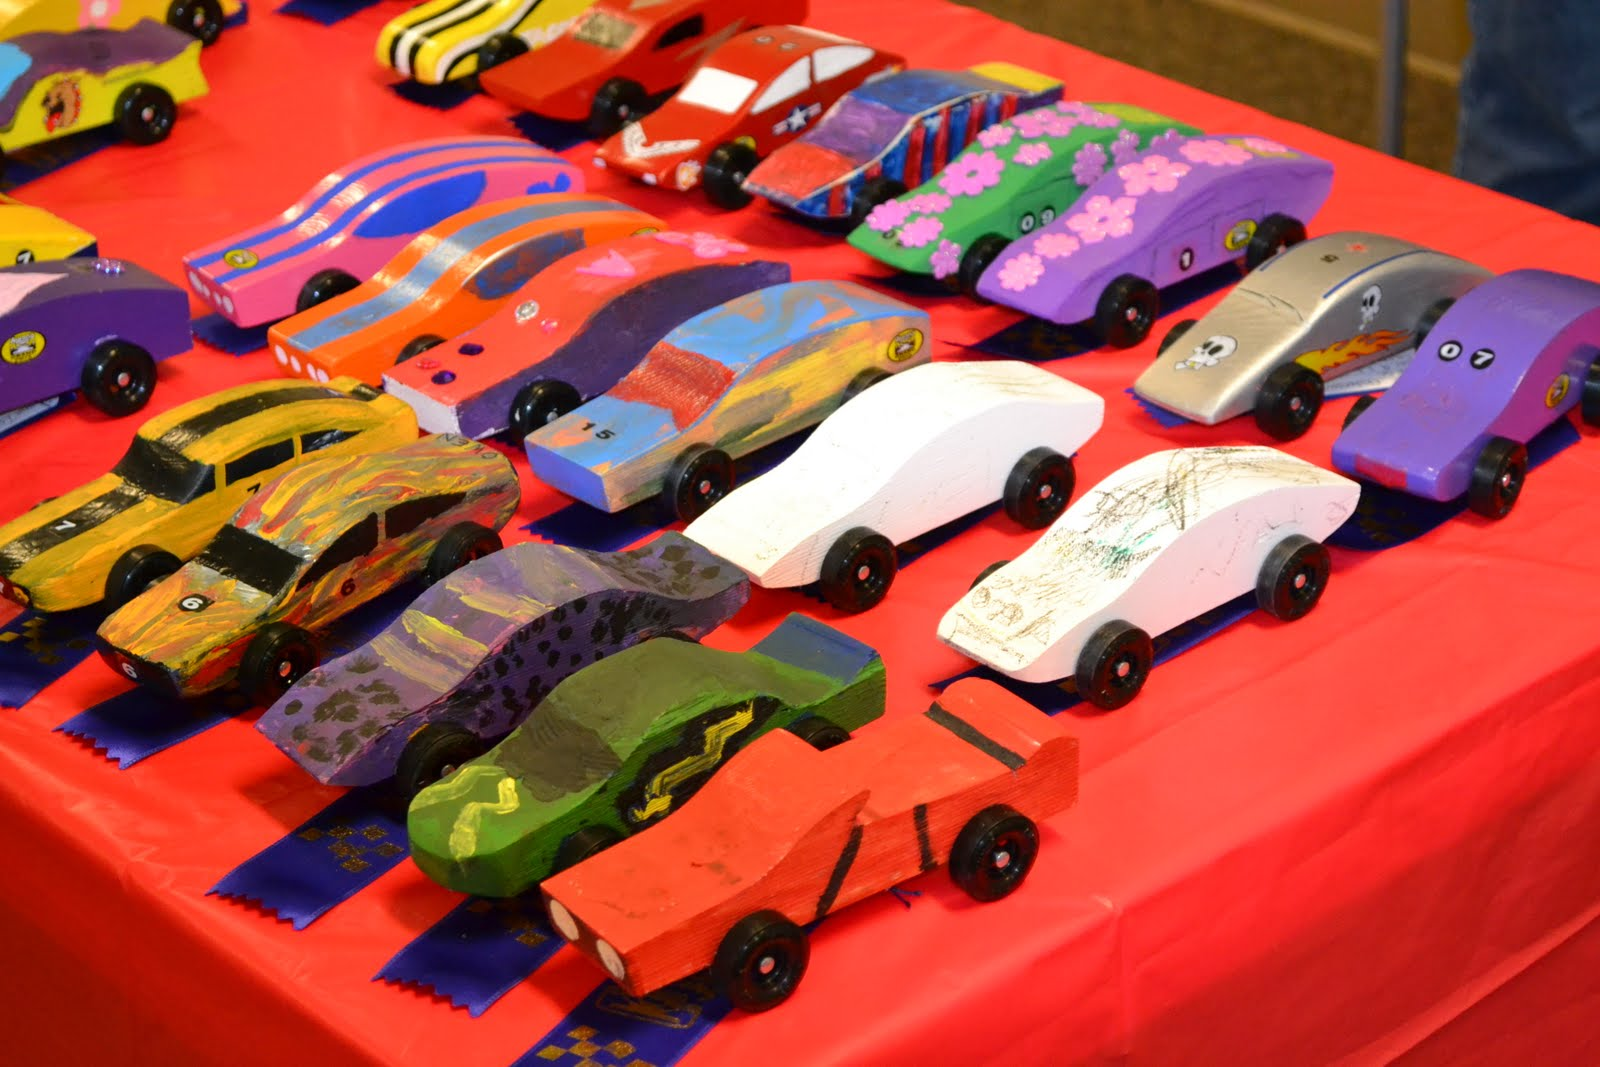 Awana grand prix cars photos Home Derby Worx Pro Board